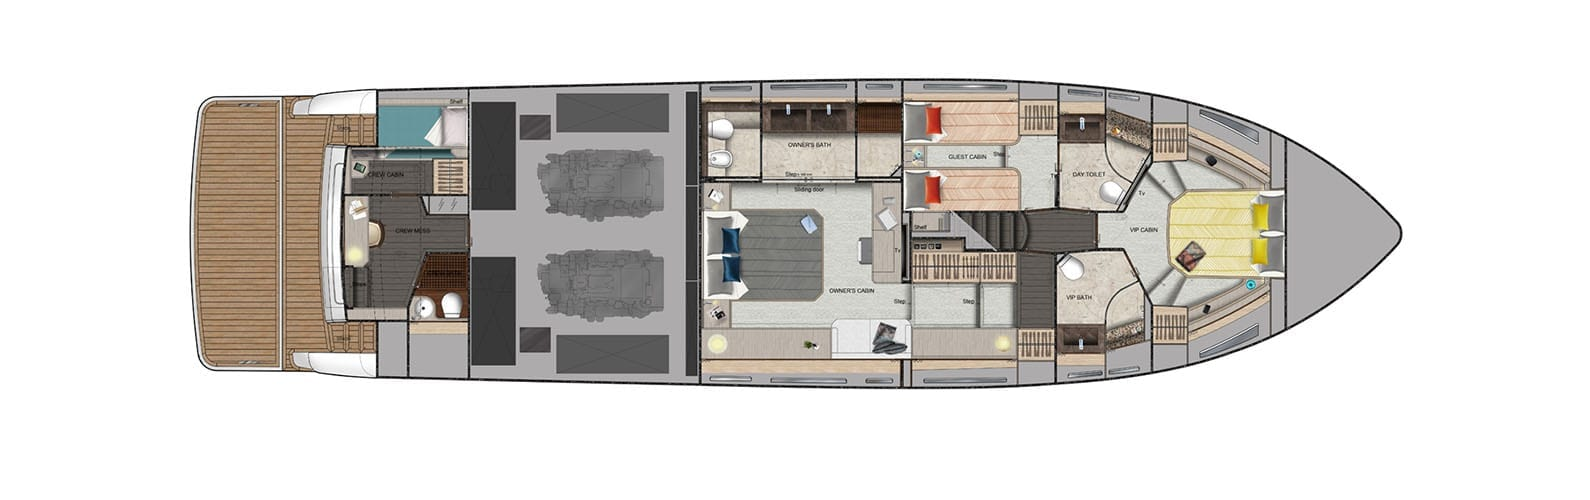 Uniesse-Capri-7-footprint-7